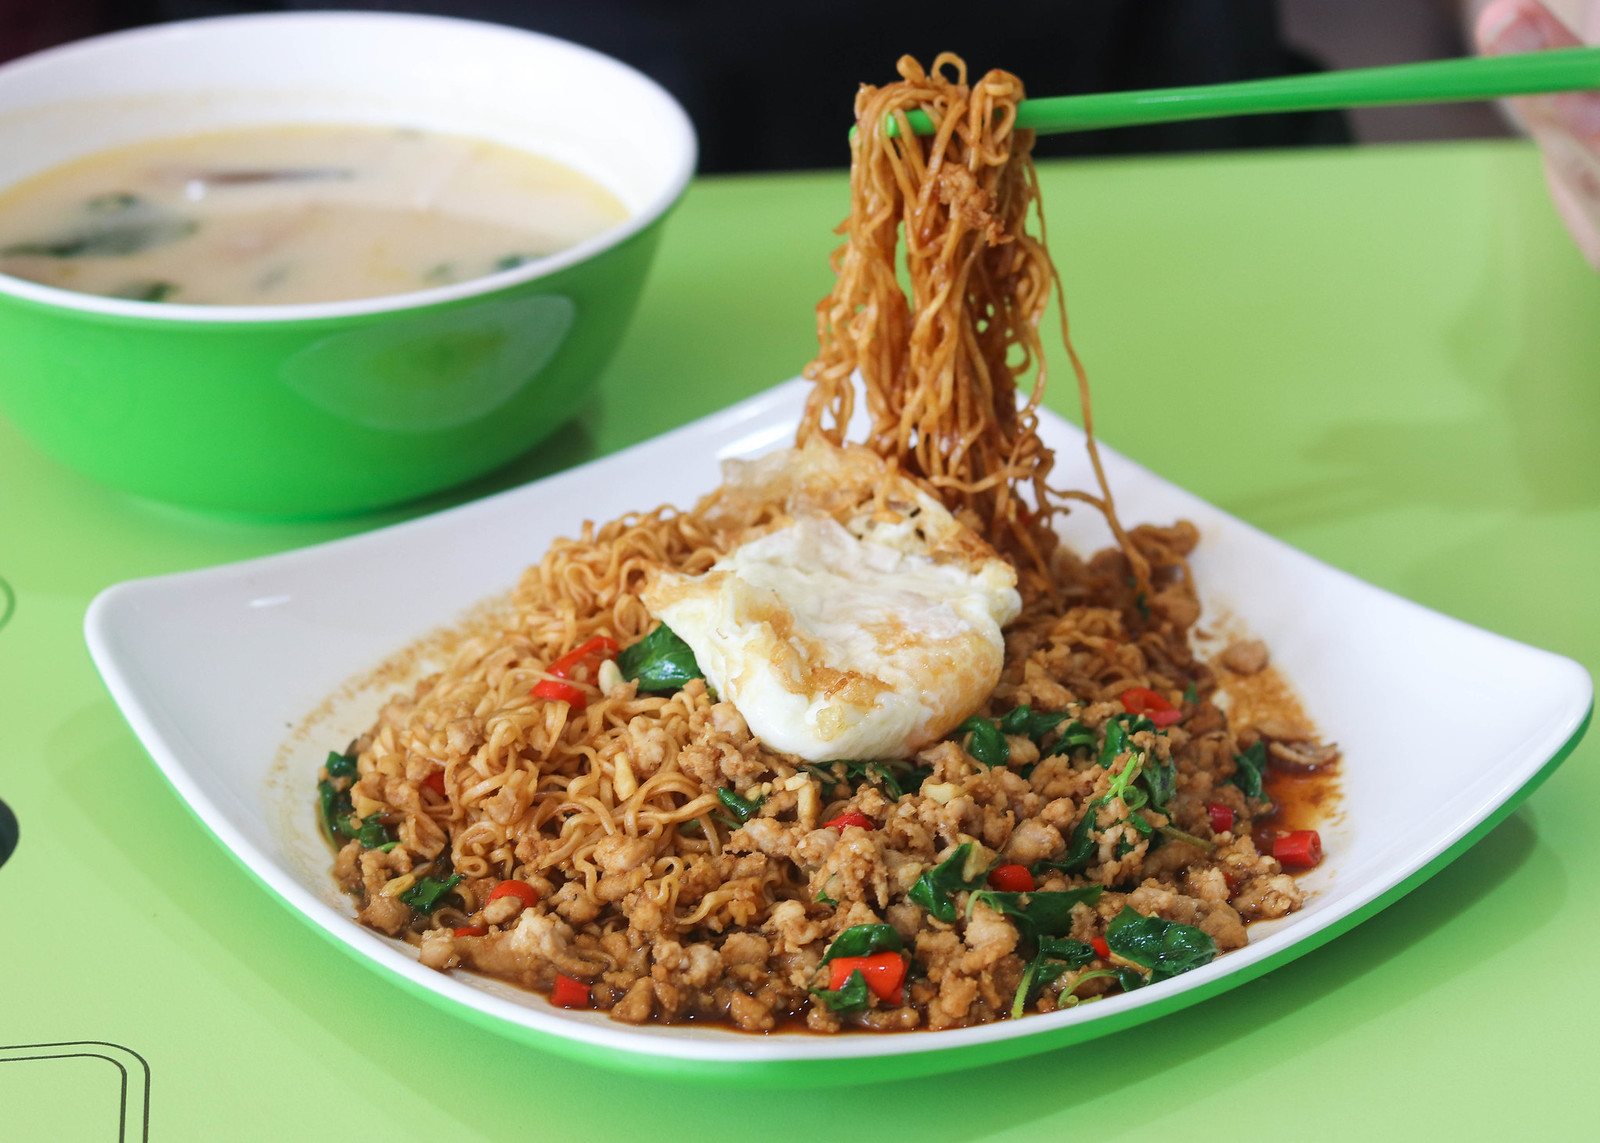 amoy street food centre sap thai food_-3